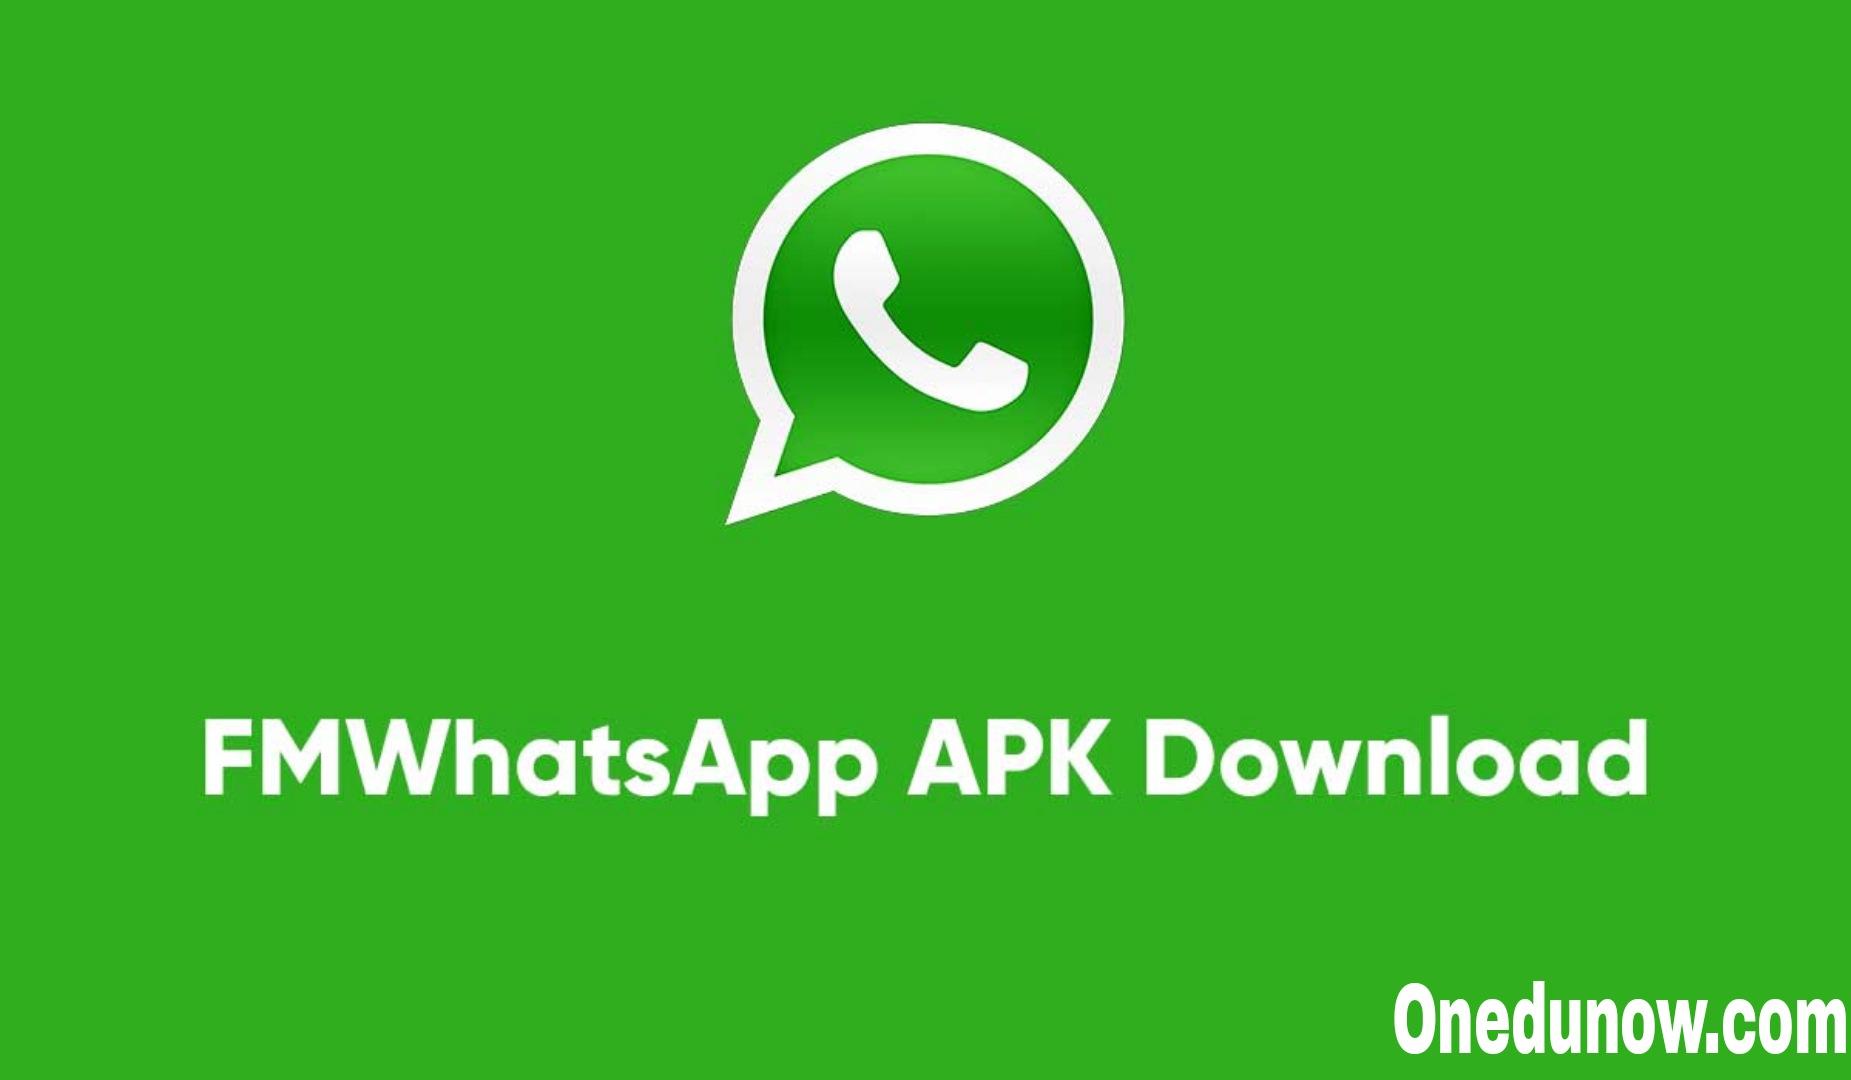 FMWhatsApp APK Download (Latest Version) September 2021